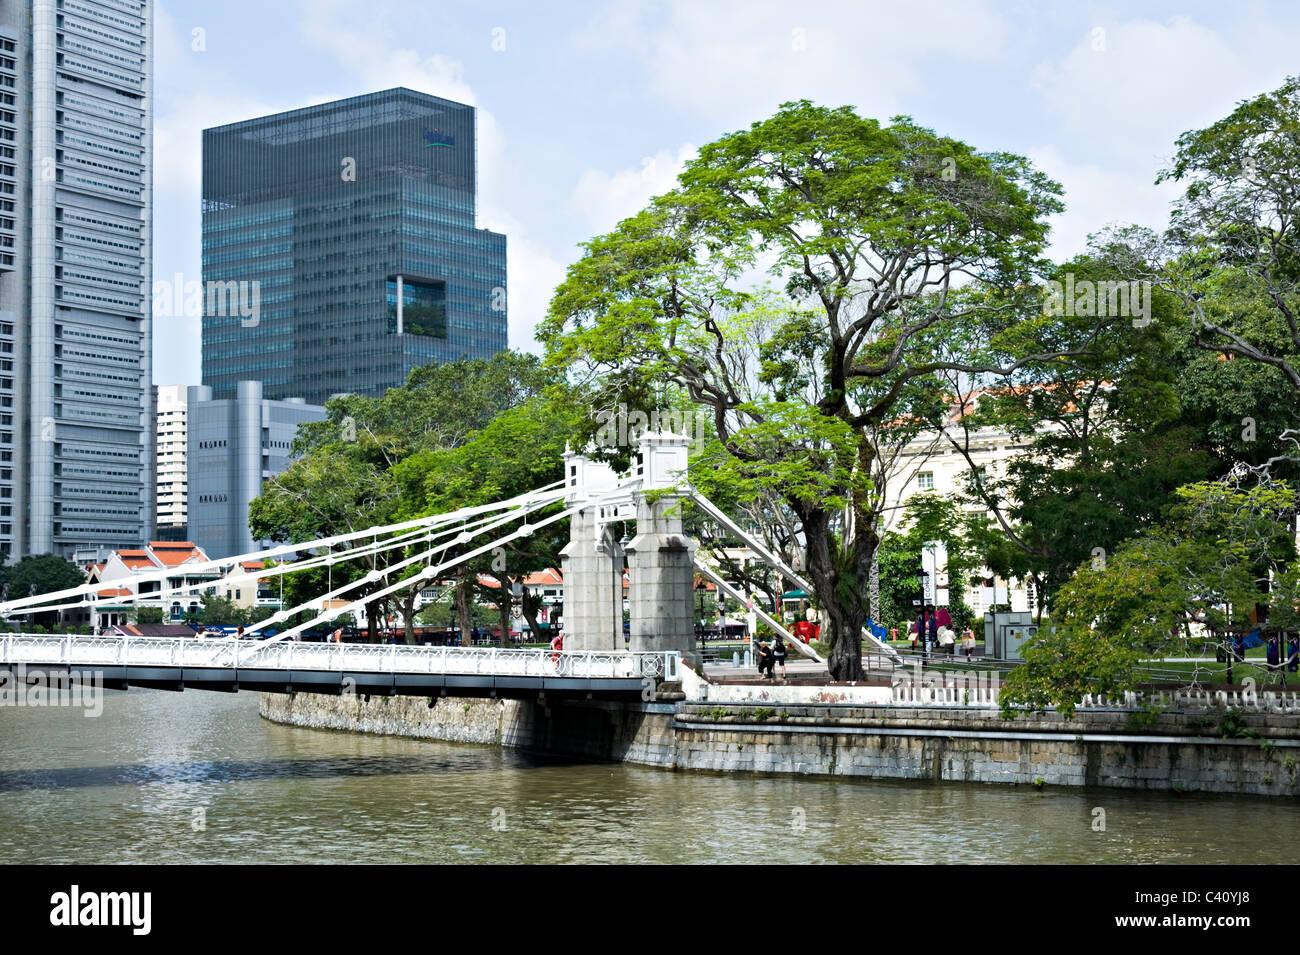 The Old Cavenagh Pedestrian Bridge Crosses Singapore River in Central Singapore Asia - Stock Image